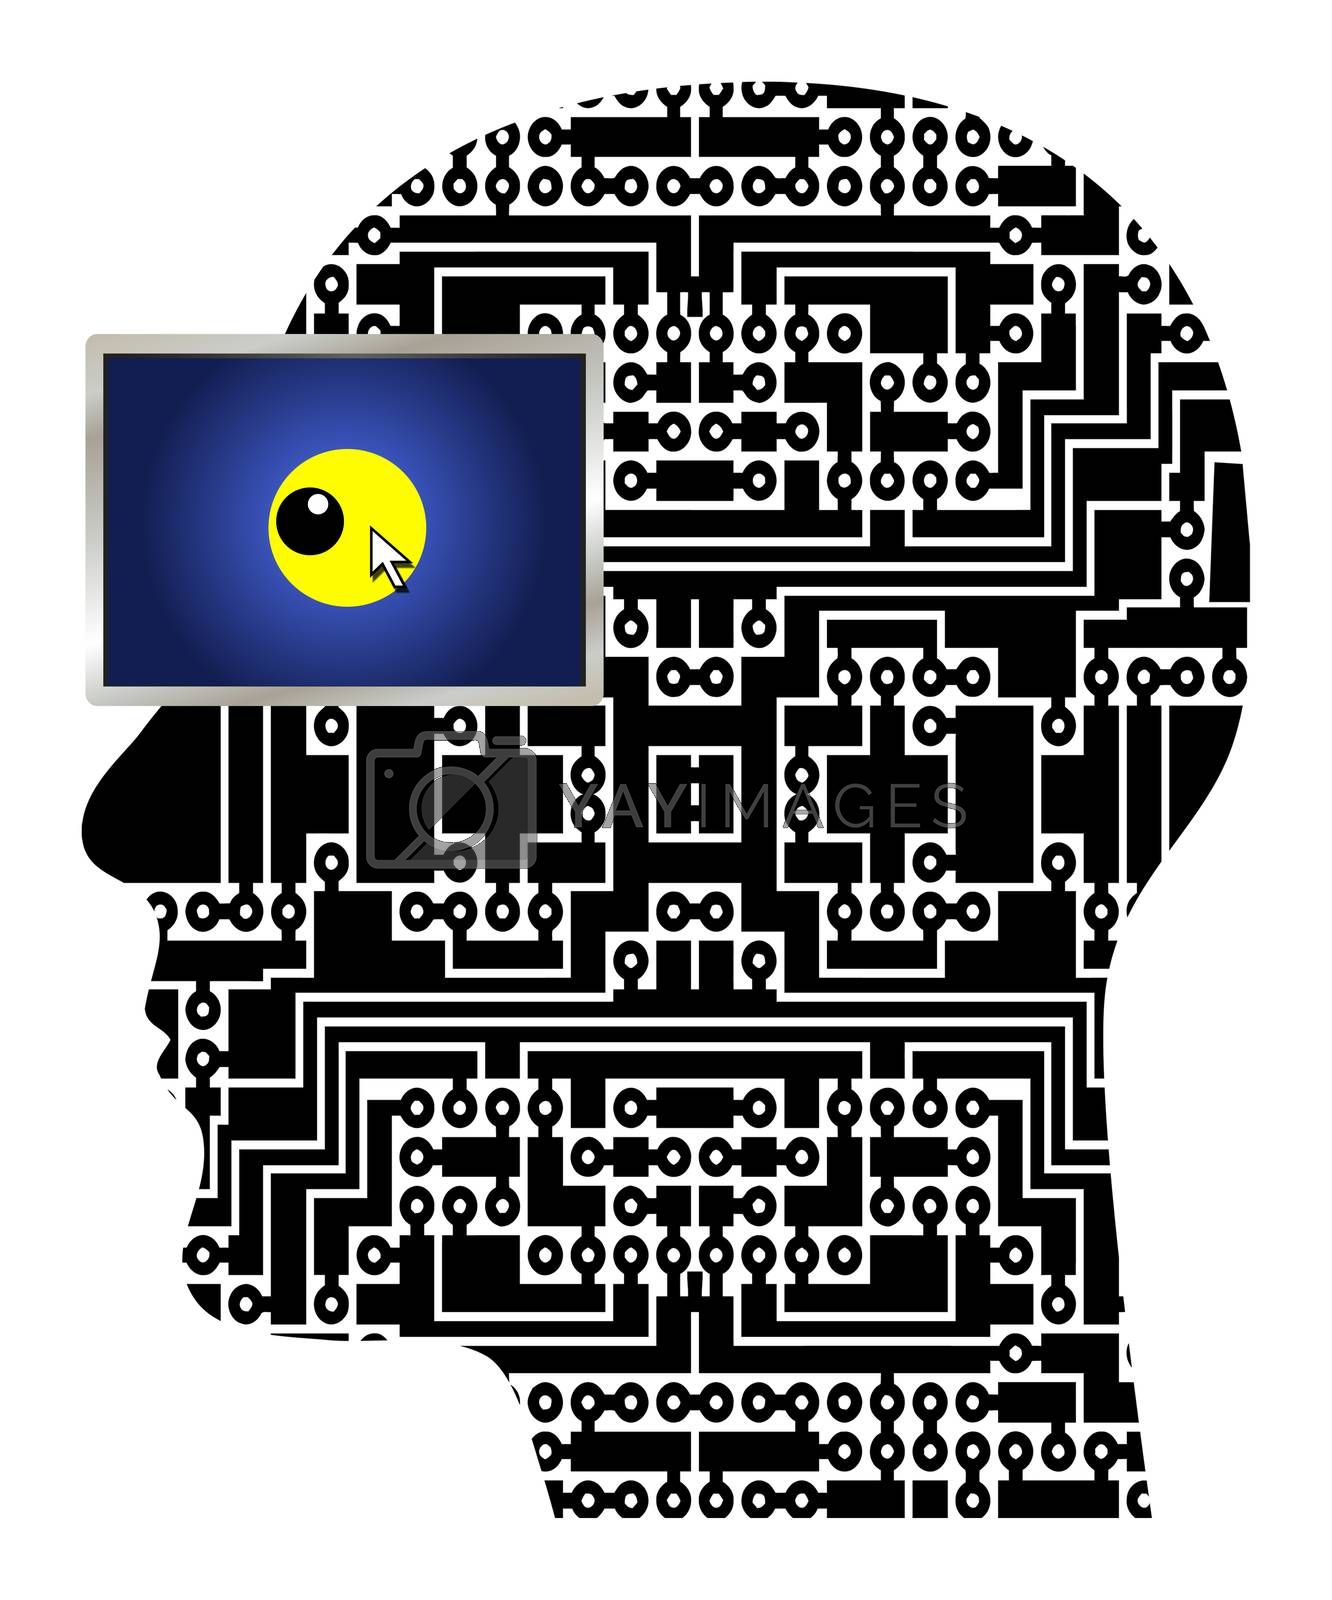 Computer Nerd, Computer Idiot, Computer Geek. Symbol and concept for a computer addict